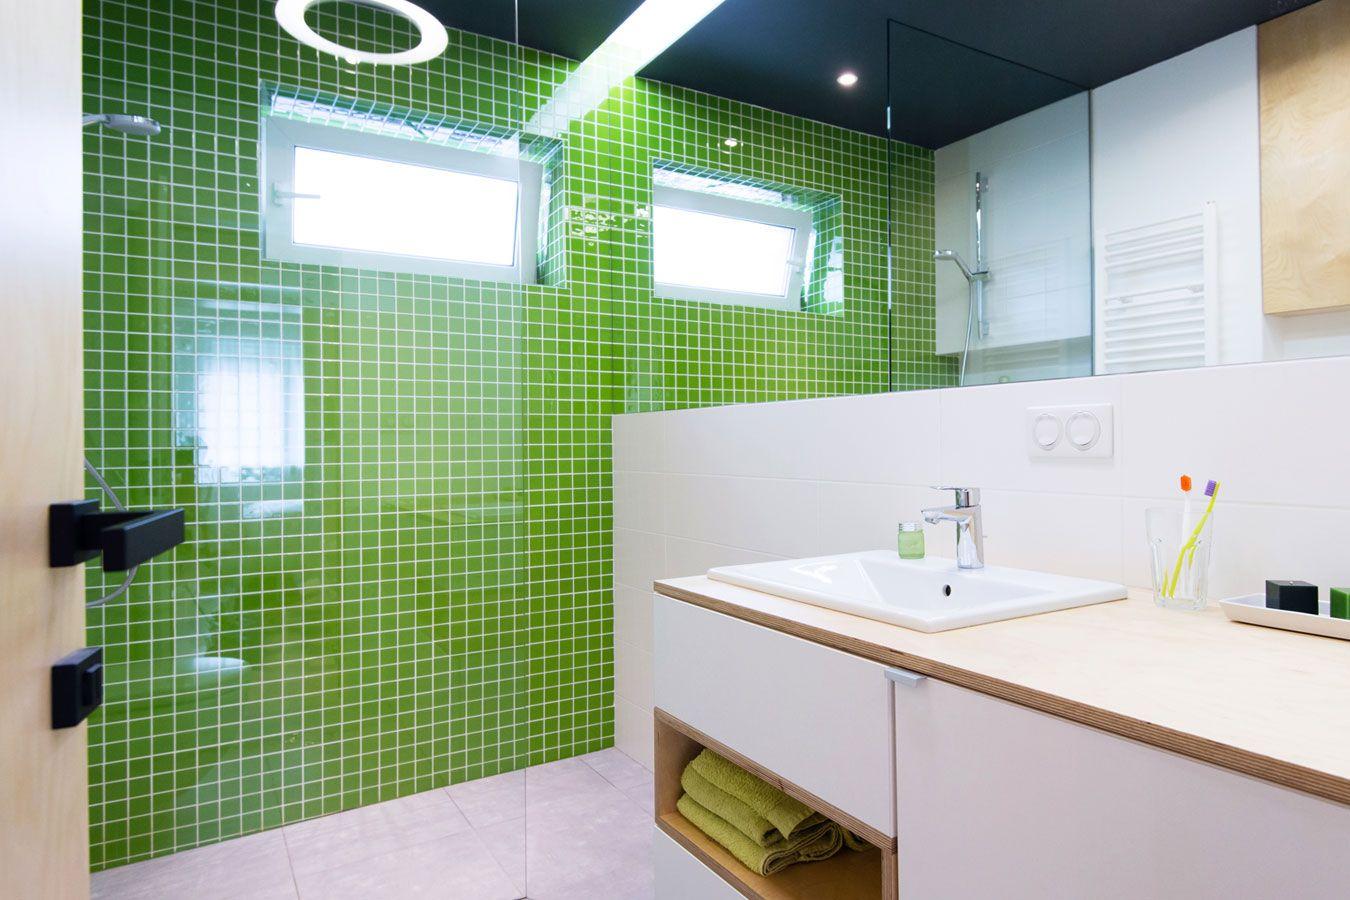 Wildverband Tegels Badkamer : Badkamer en vloertegels woonkamer enkhuizen streker